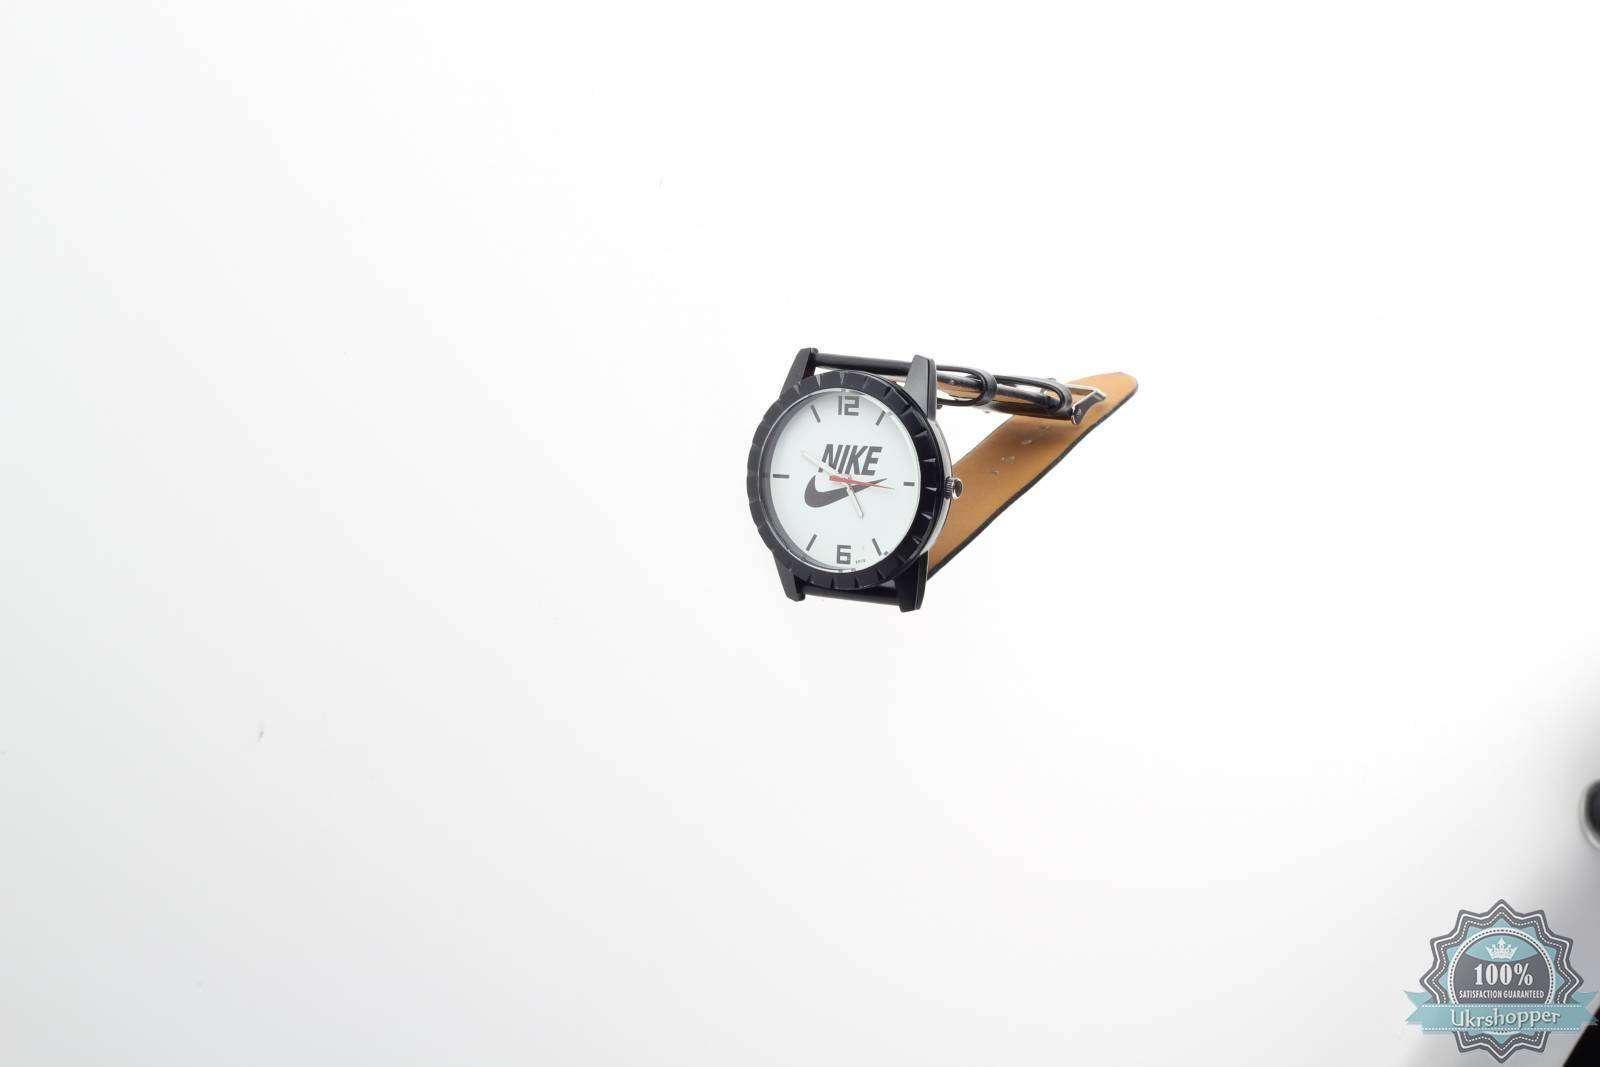 Aliexpress: Обзор спортивных часов Nike